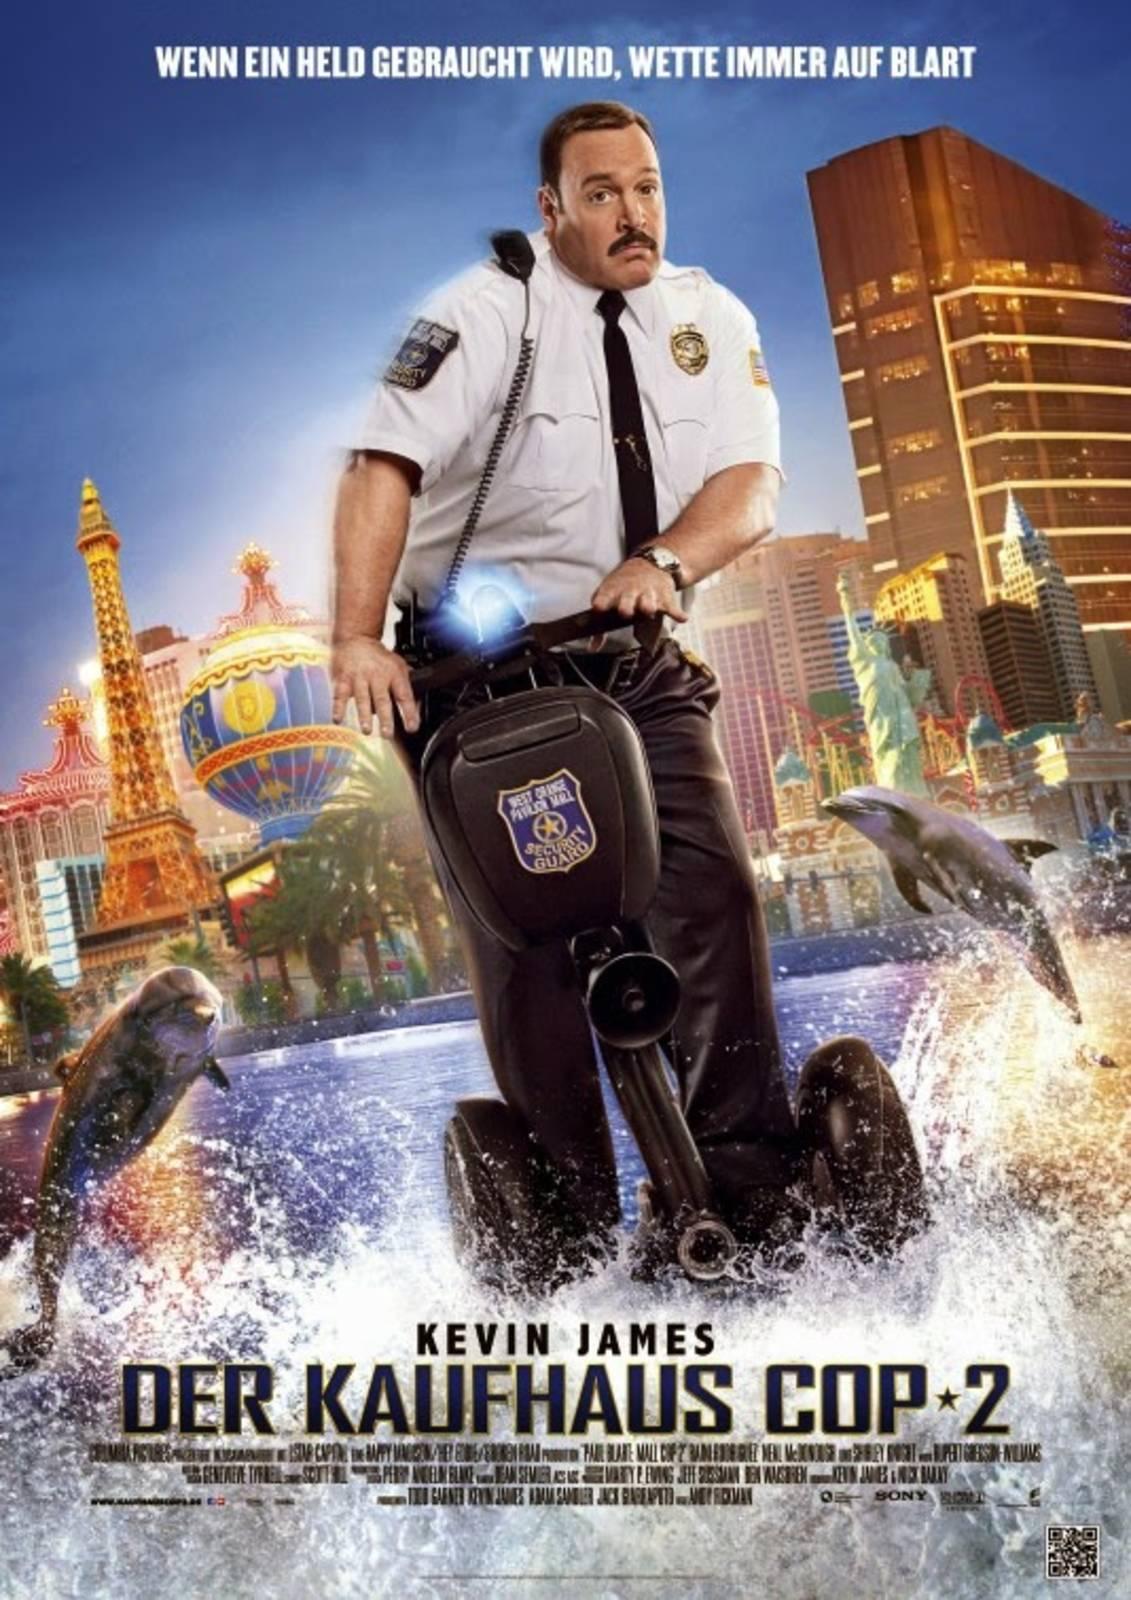 movie paul blart mall cop 2 cineman